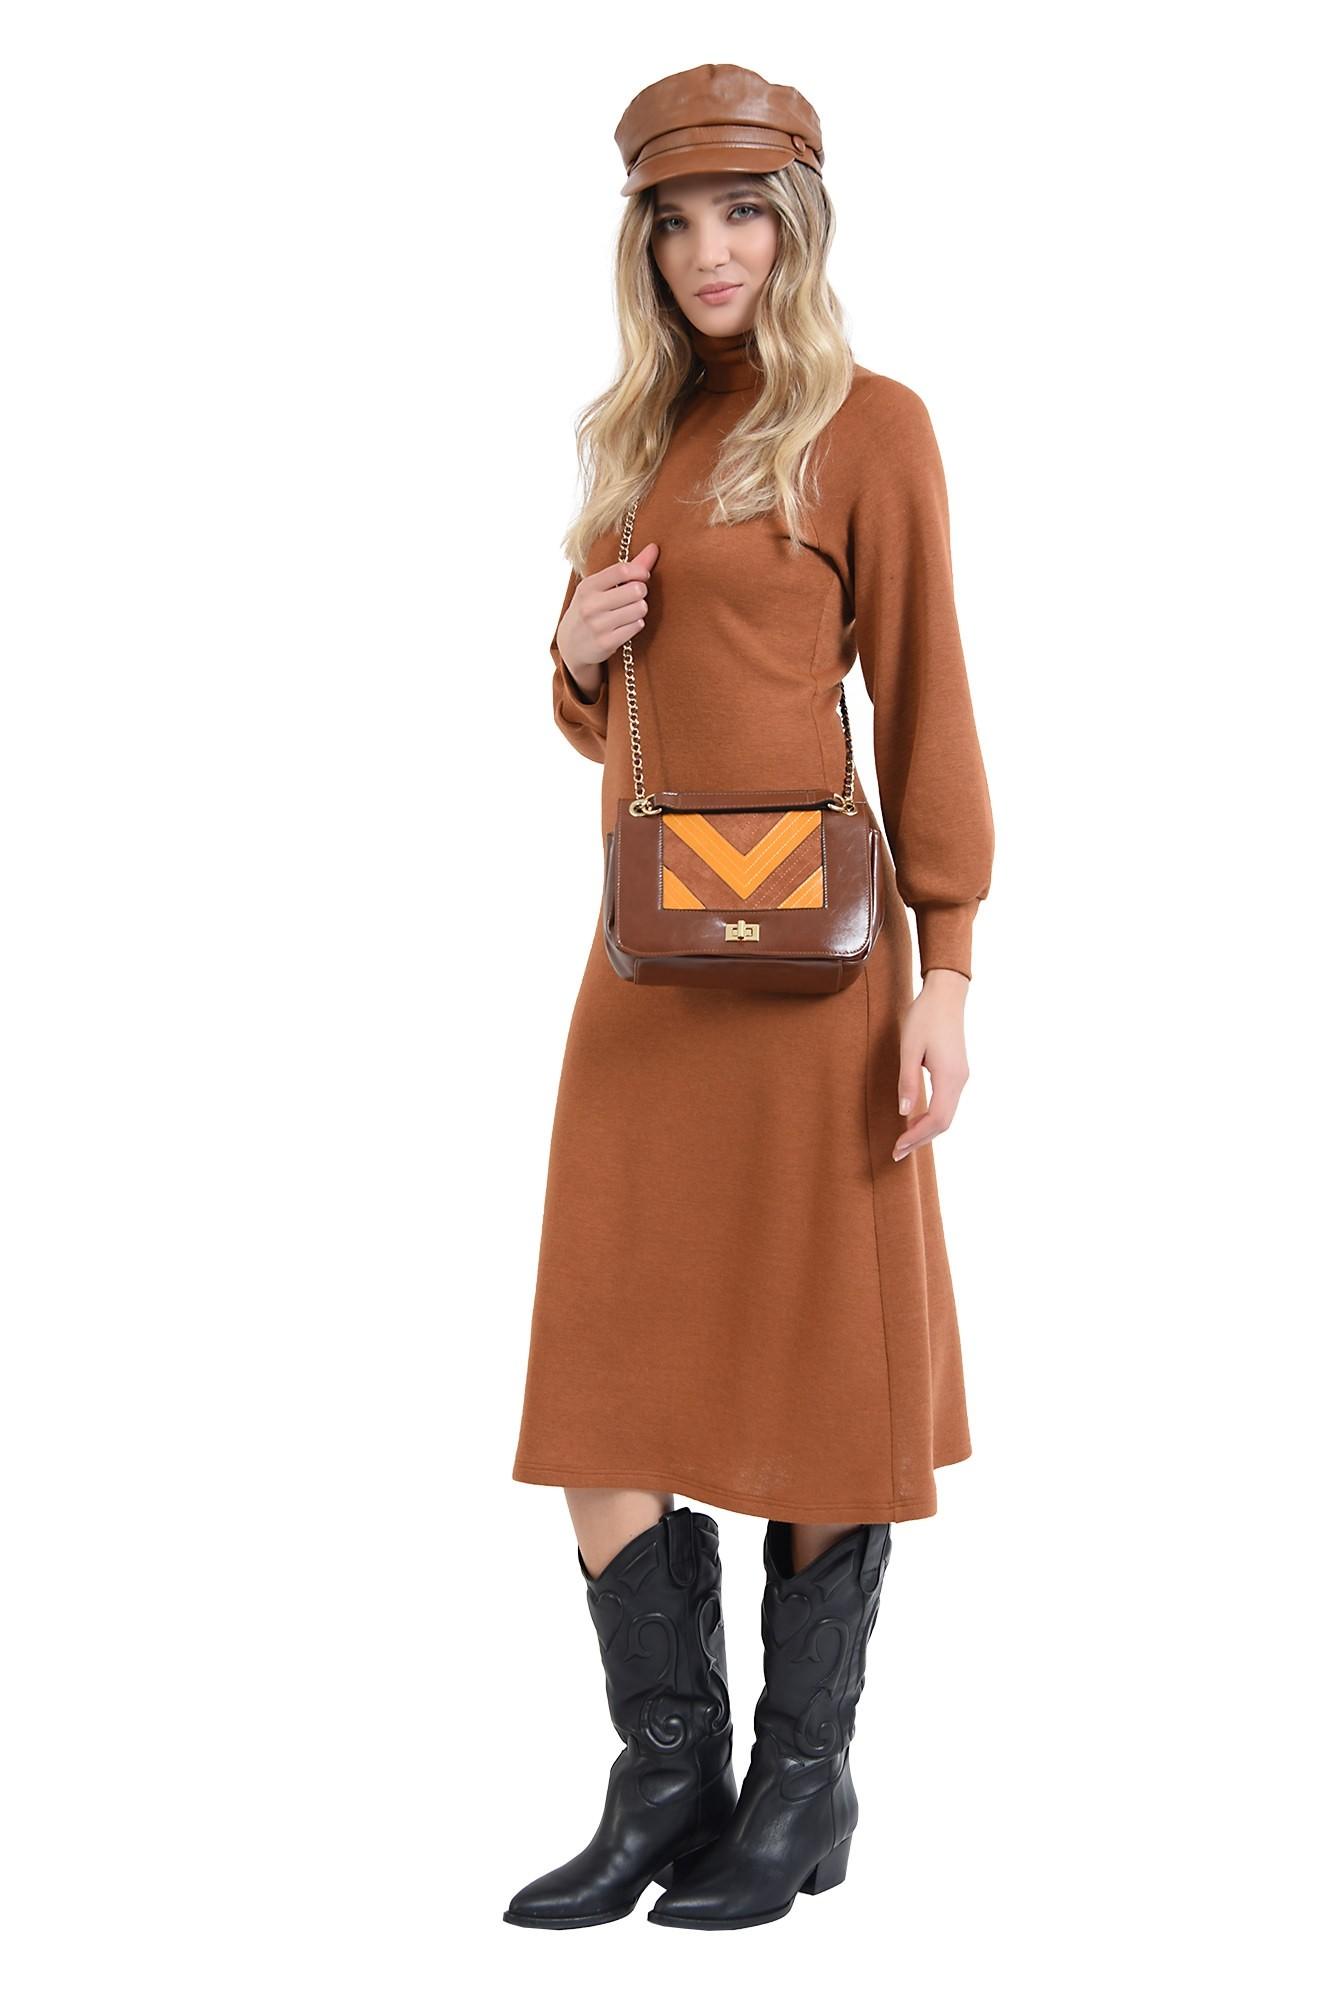 3 - 360 - rochie midi, evazata, din tricot, cu maneca bufanta